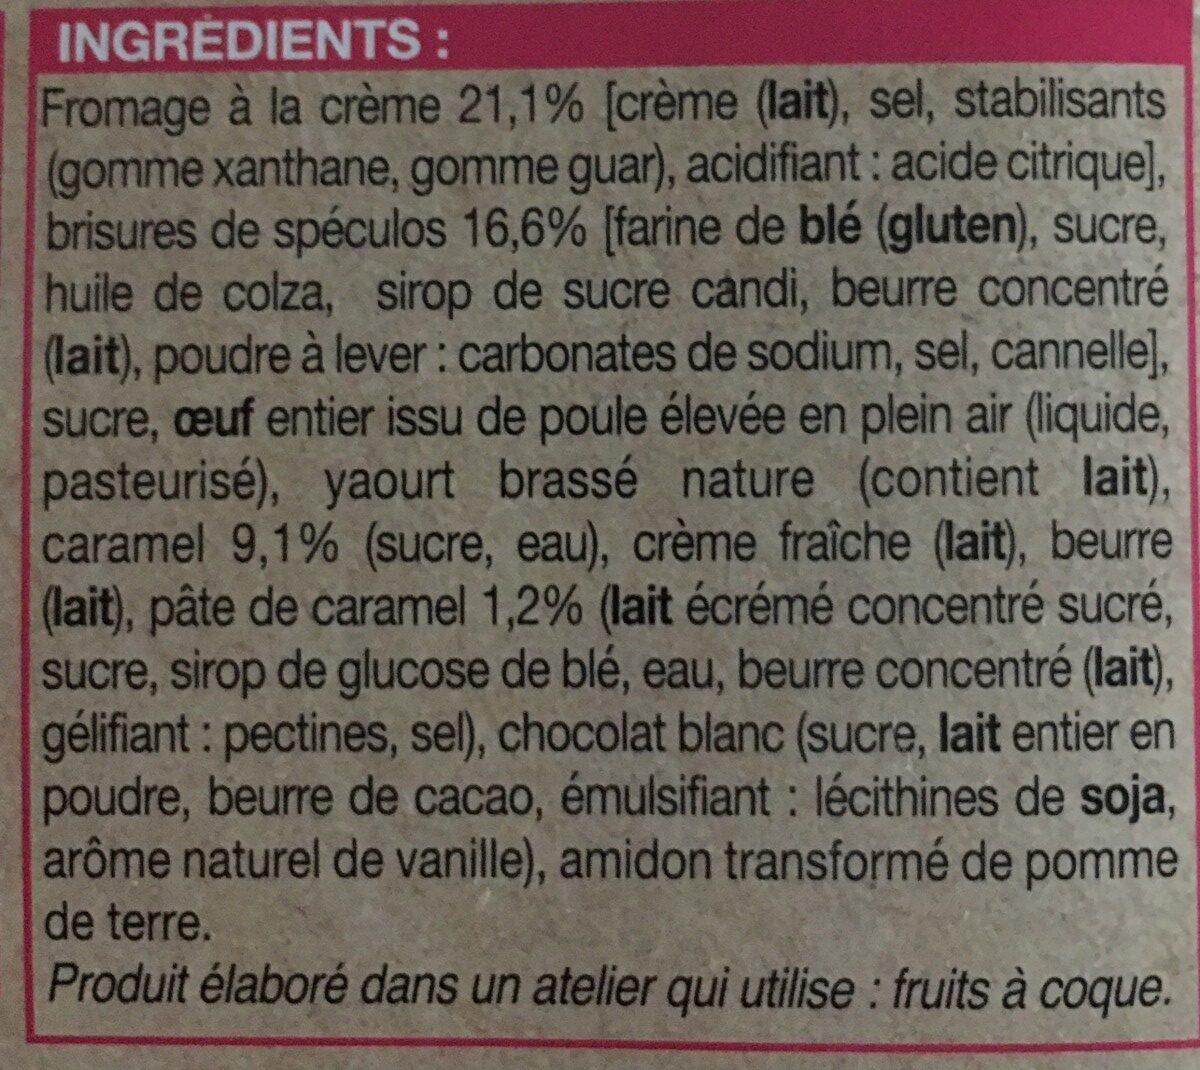 Cheesecake au caramel - Ingredients